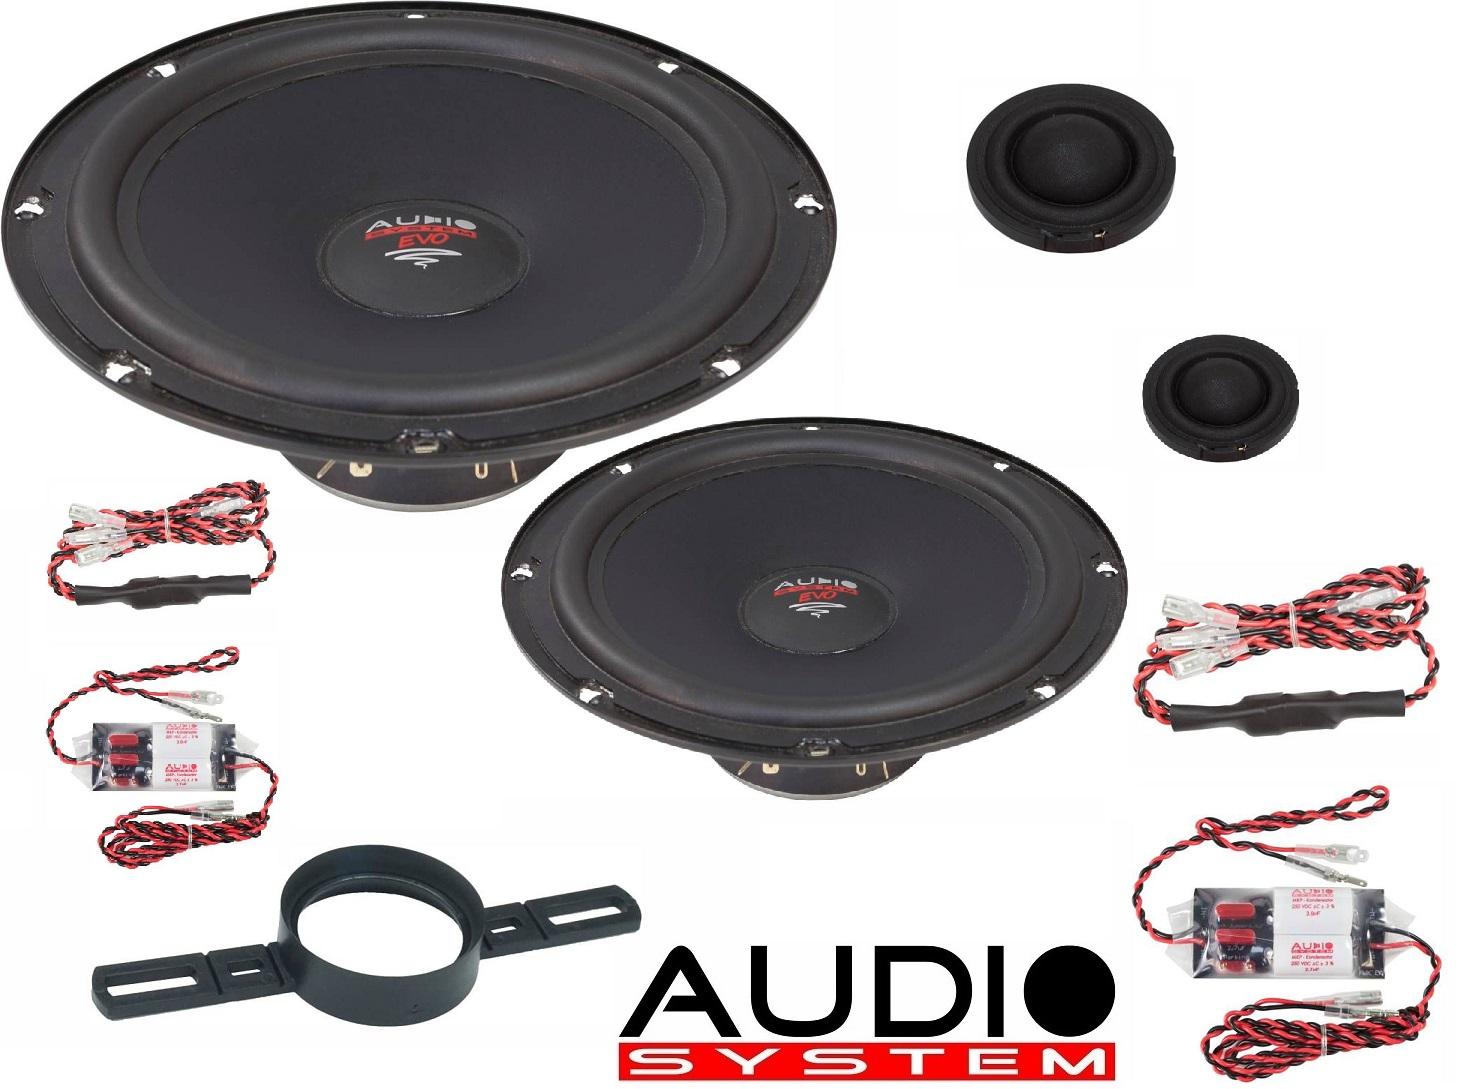 Audio System X 200 EM EVO 2 Lautsprecher 20cm 2-Wege EASY MOUNTING Compo System